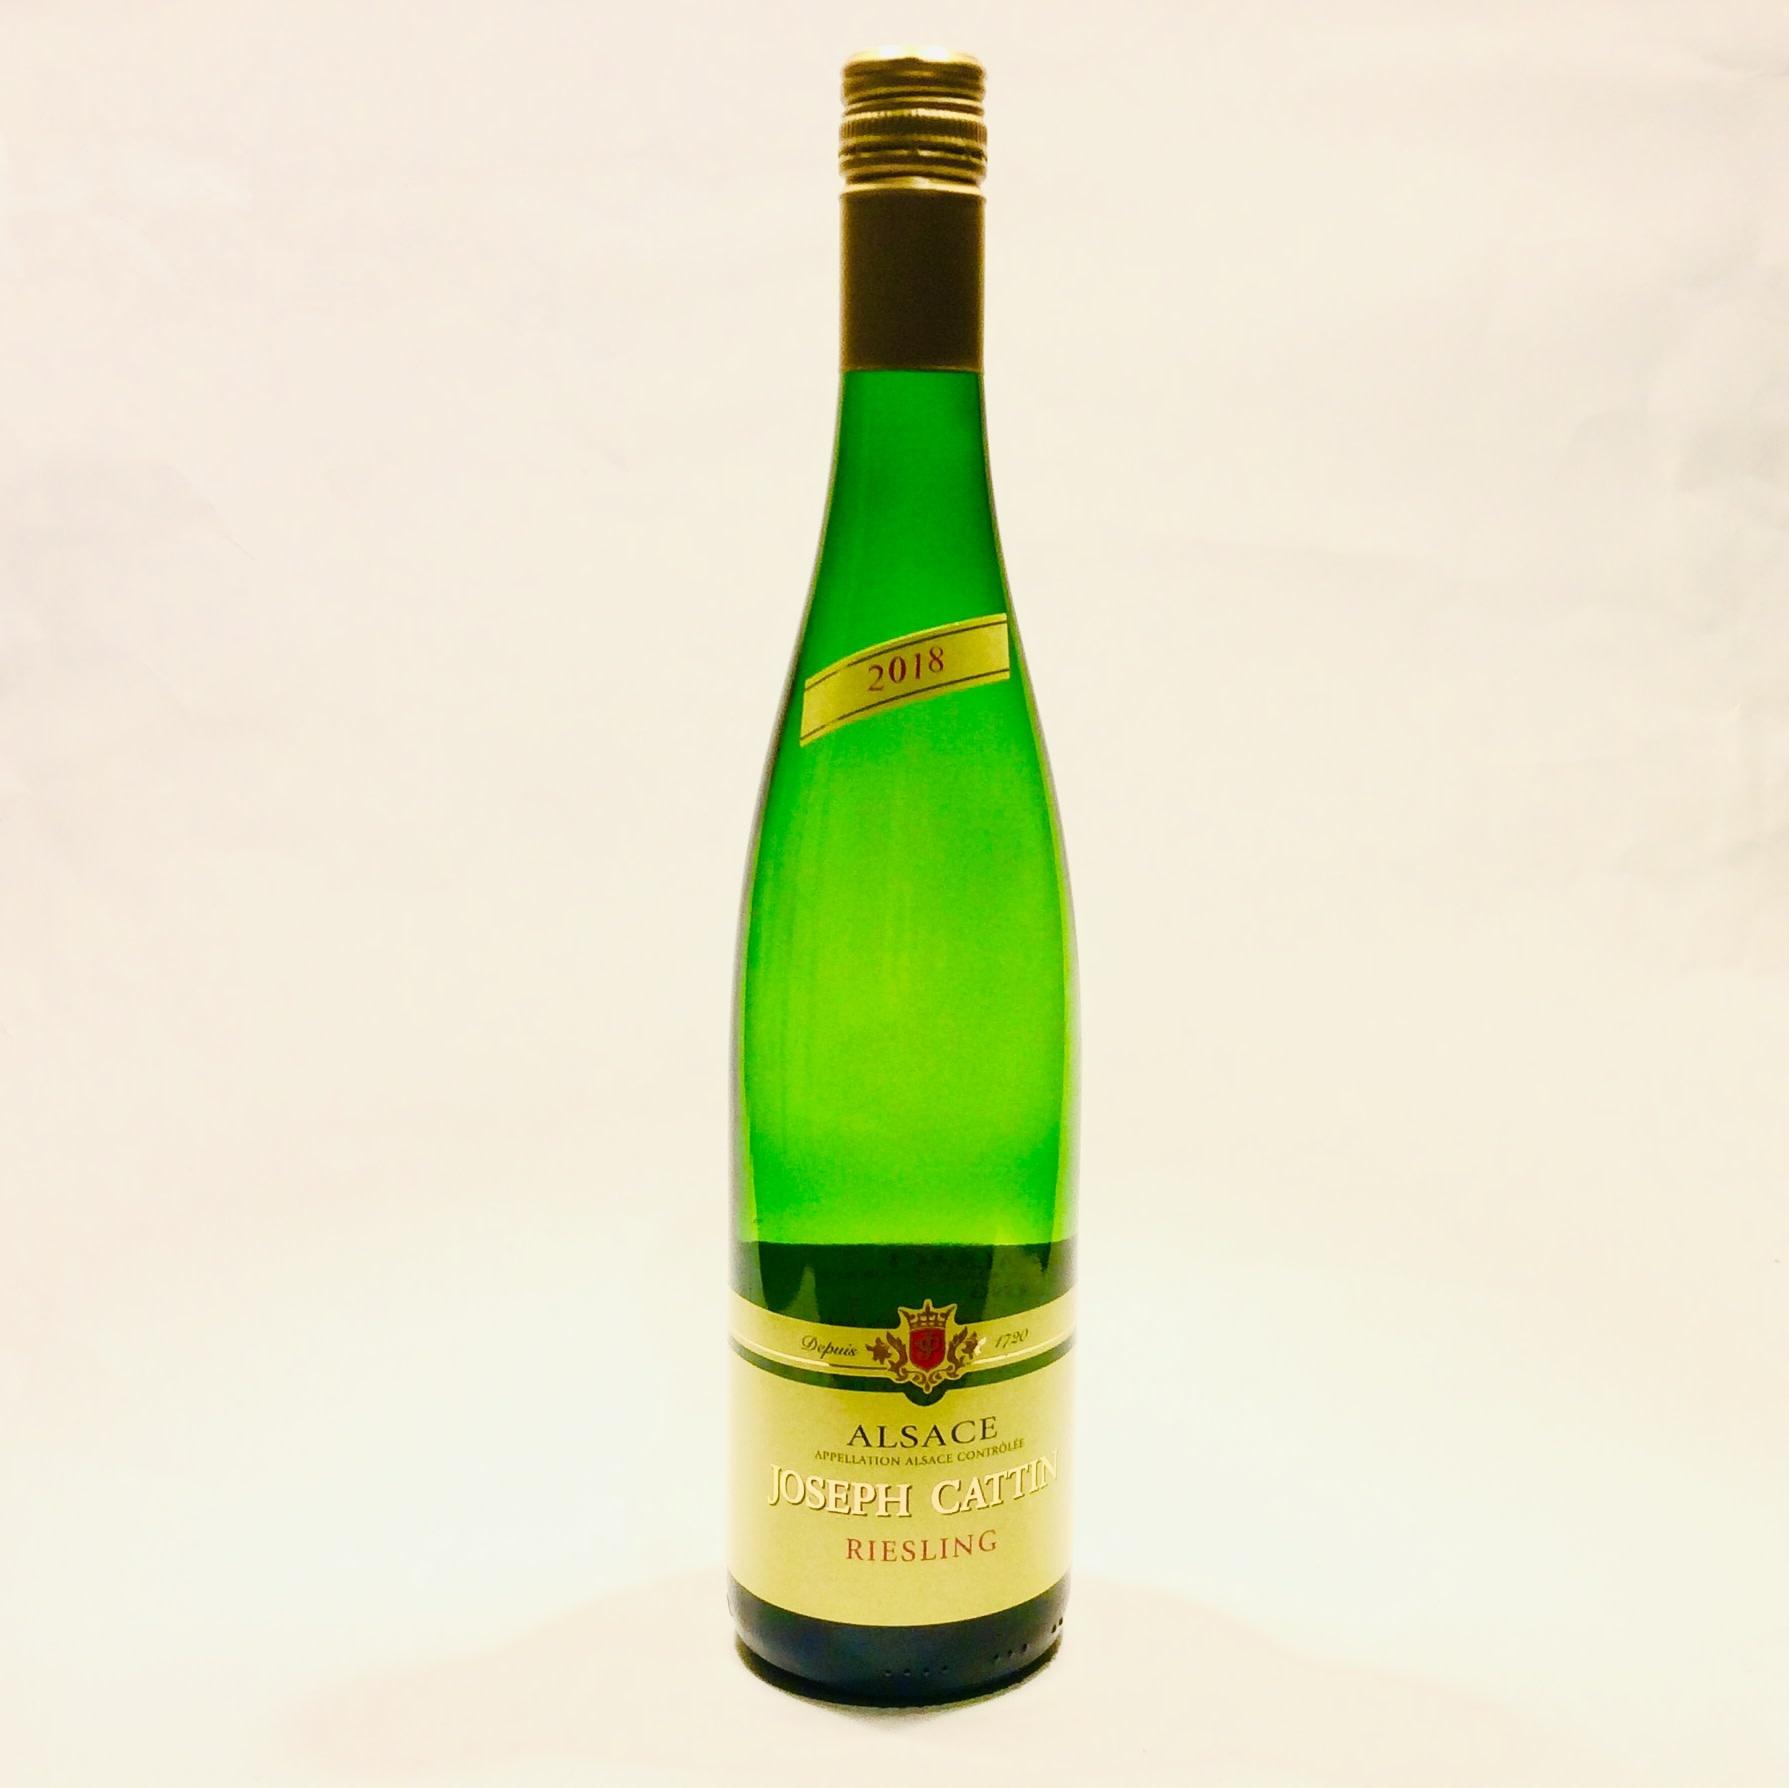 Joseph Cattin - Alsace Riesling 2018 (750 ml)